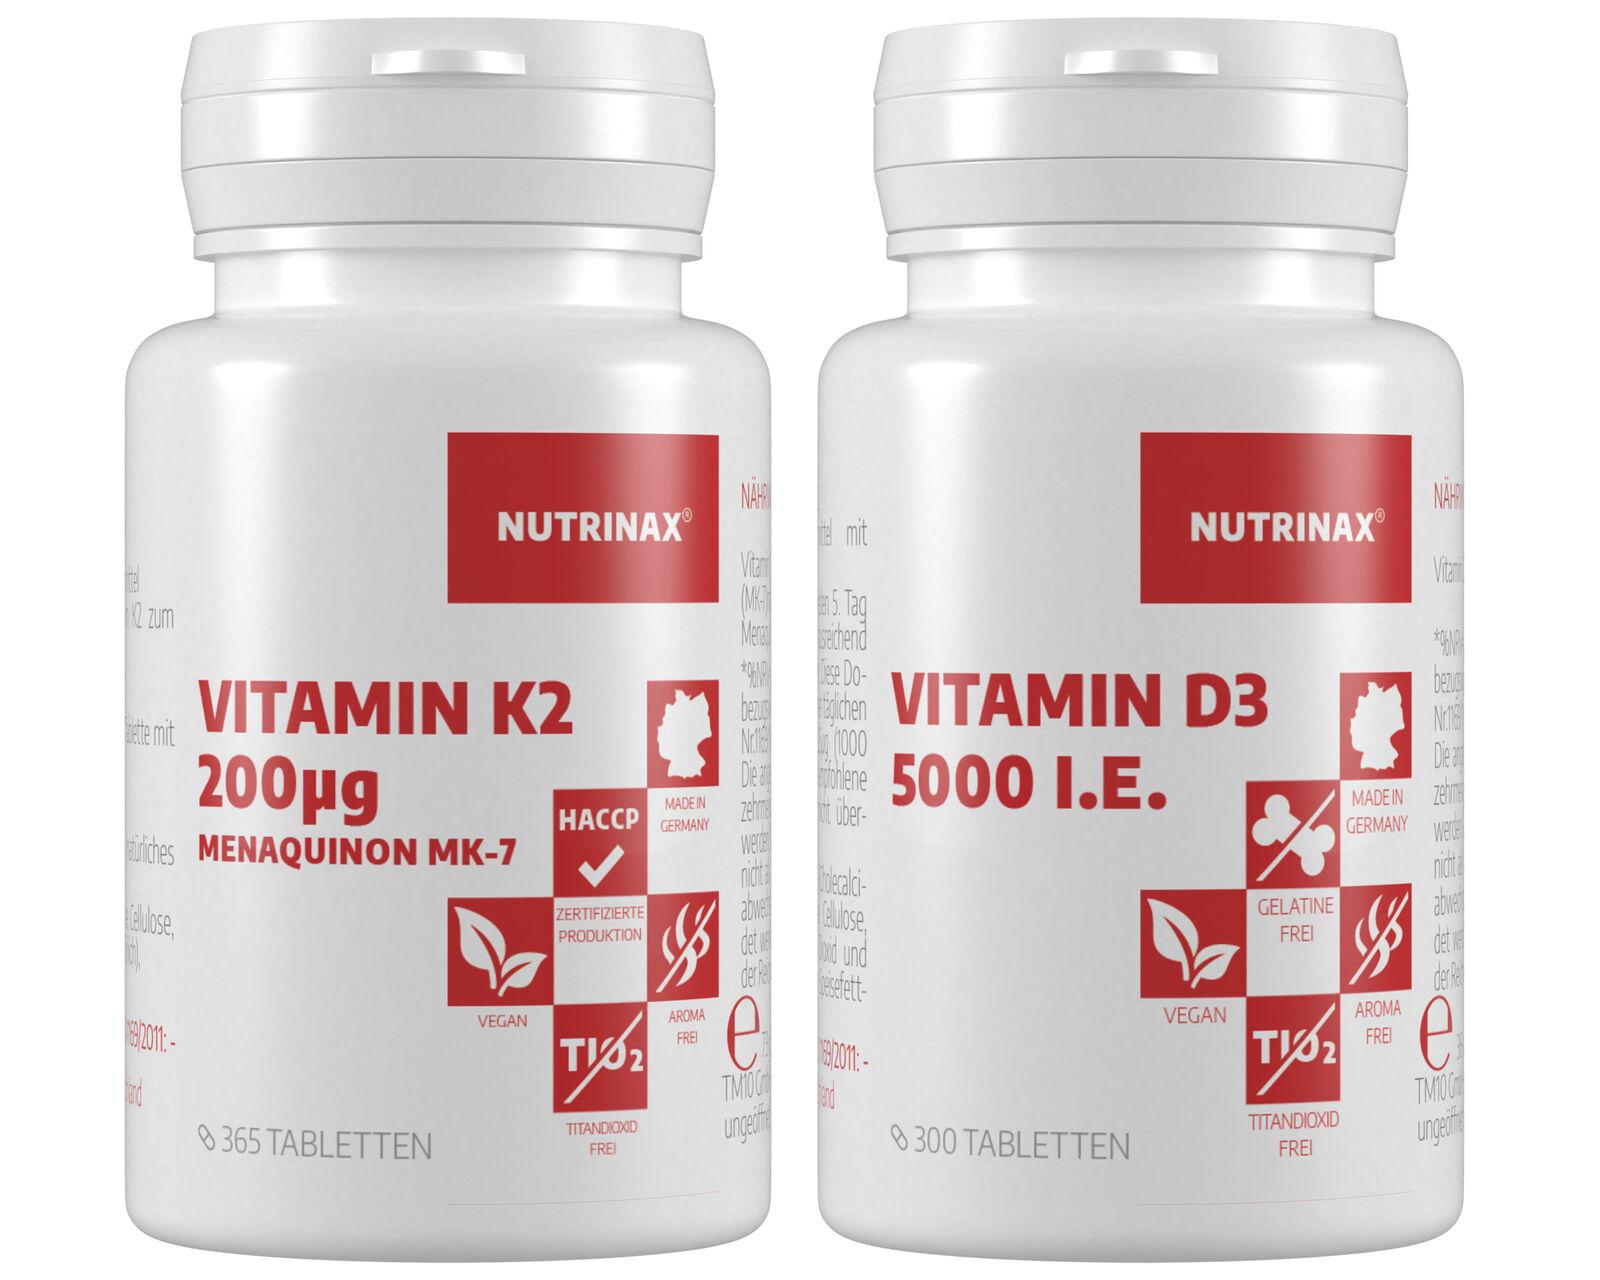 Nutrinax Vitamin K2 730 vegane Tabletten + Vitamin D3 5000 i.E. 600 Tabletten